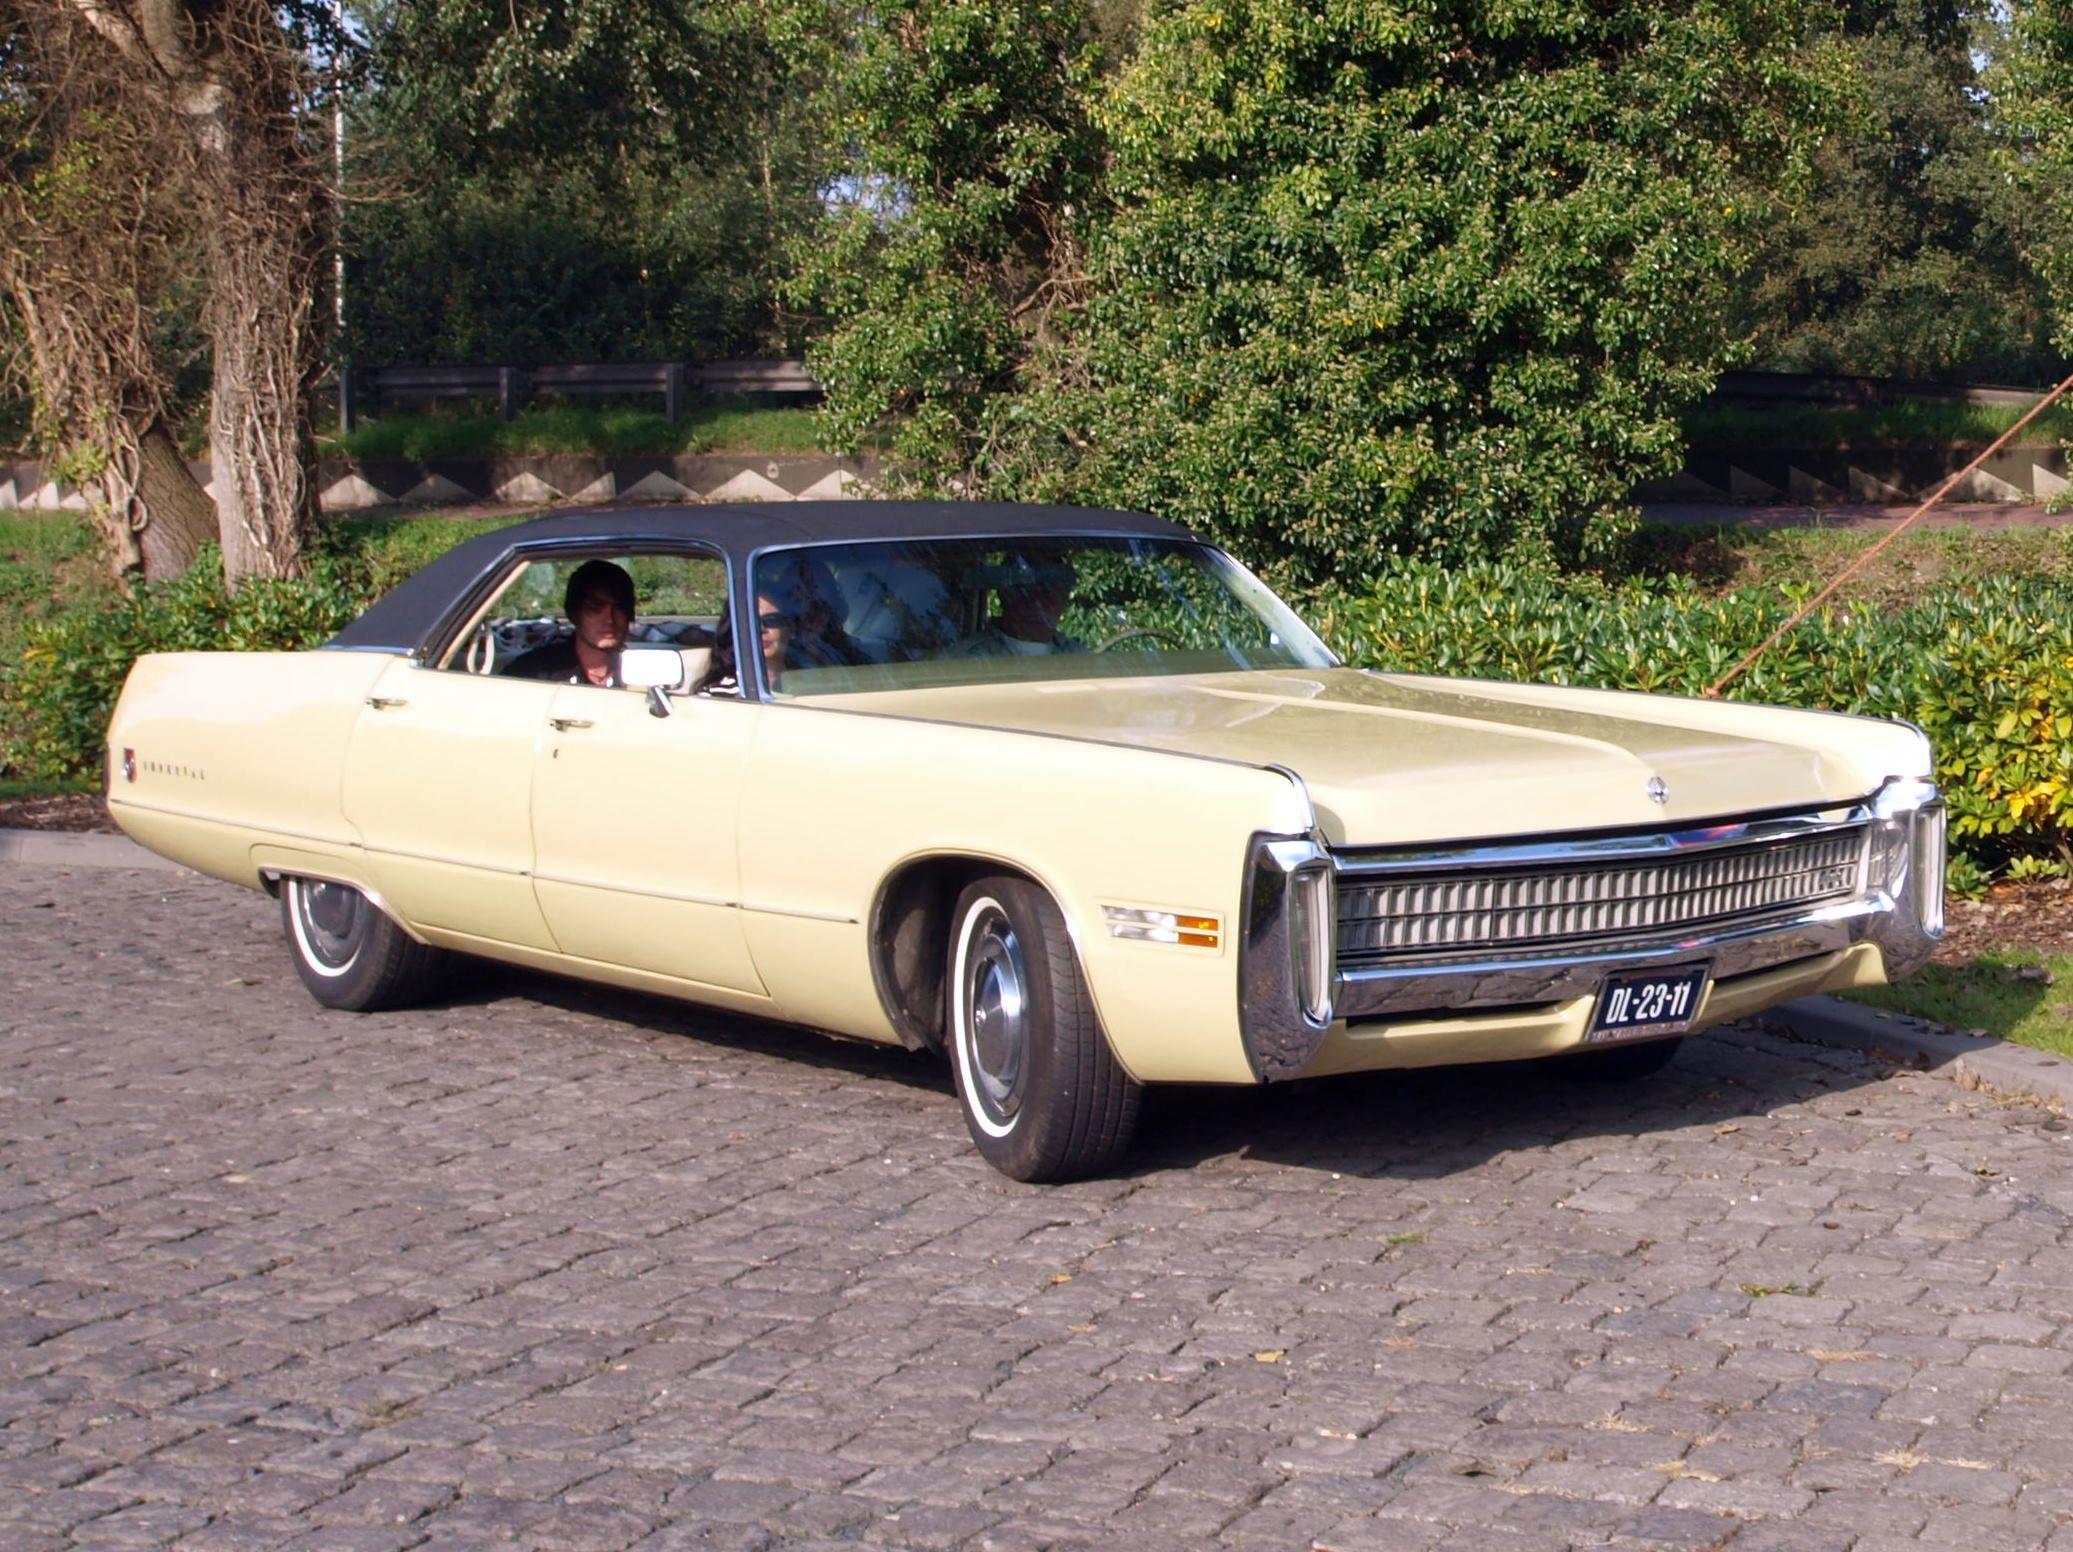 Chrysler imperial chrysler new yorker current status description from wall newpricescar